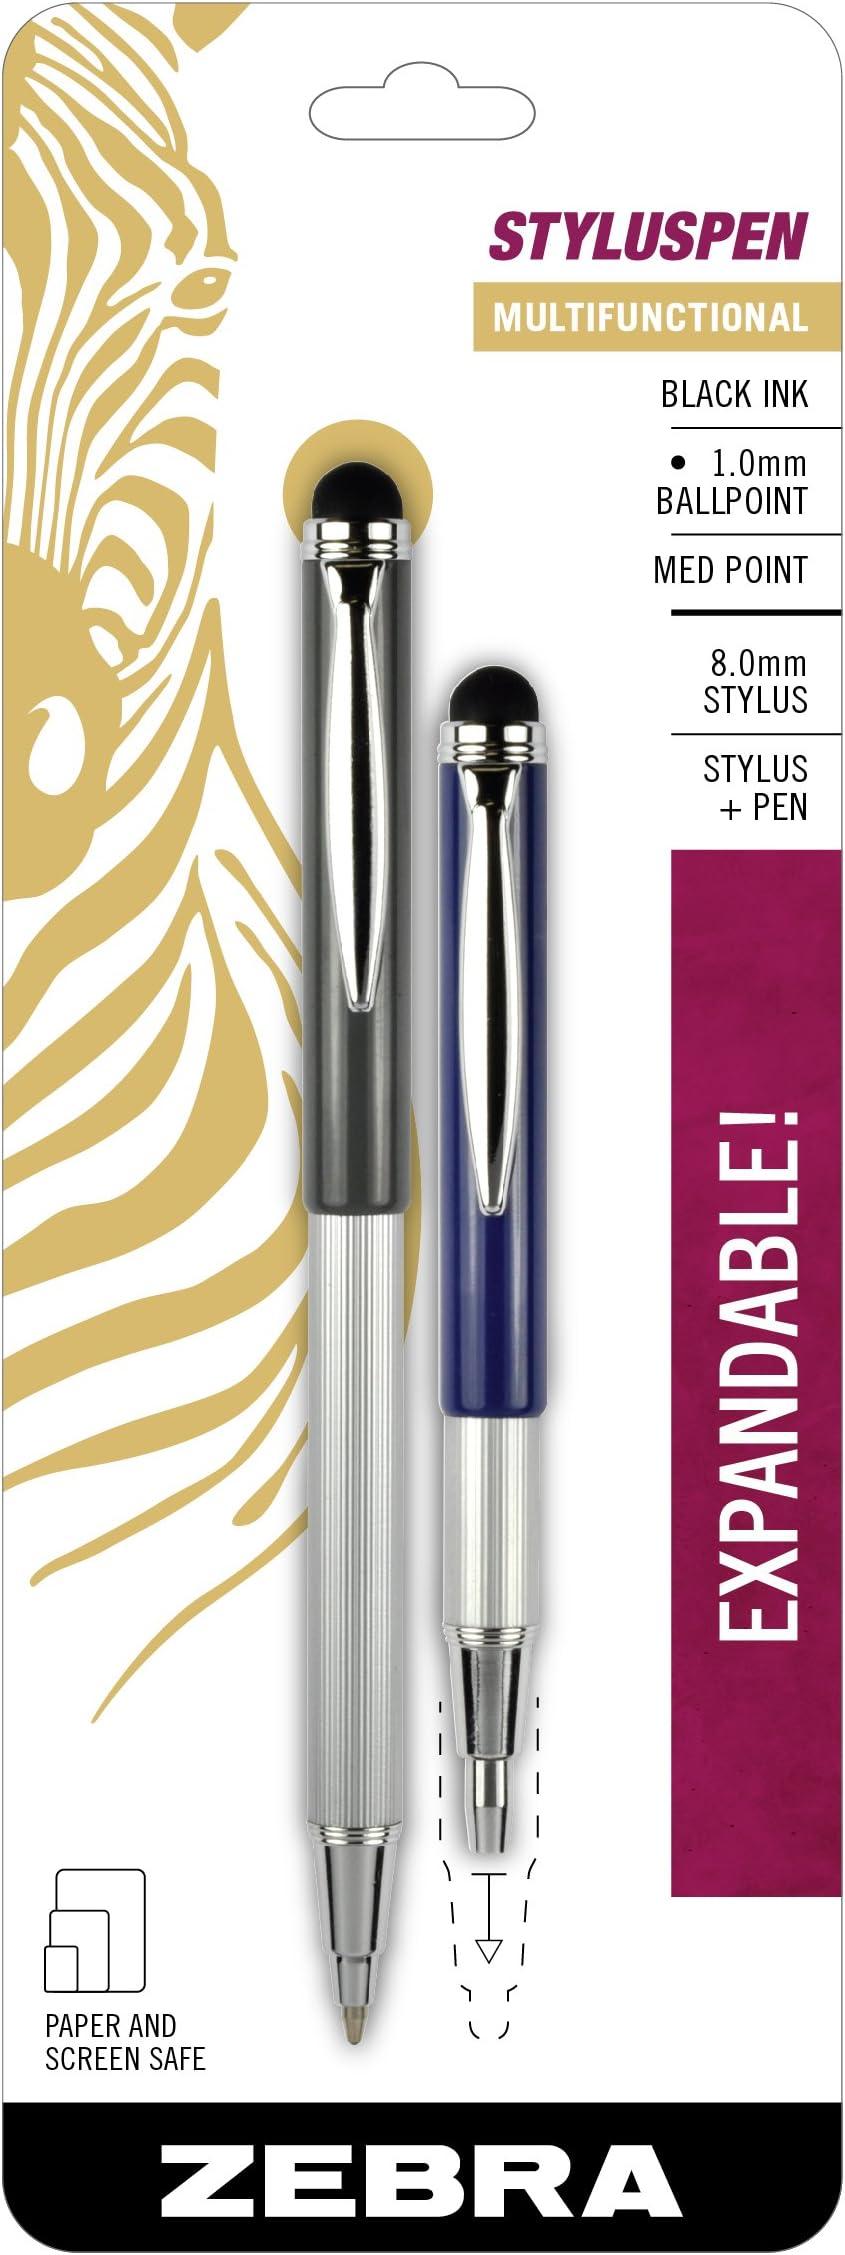 HUBUBALI Tablet Stylus Bolt Action Retractable Ballpoint Pen   **MADE to ORDER**